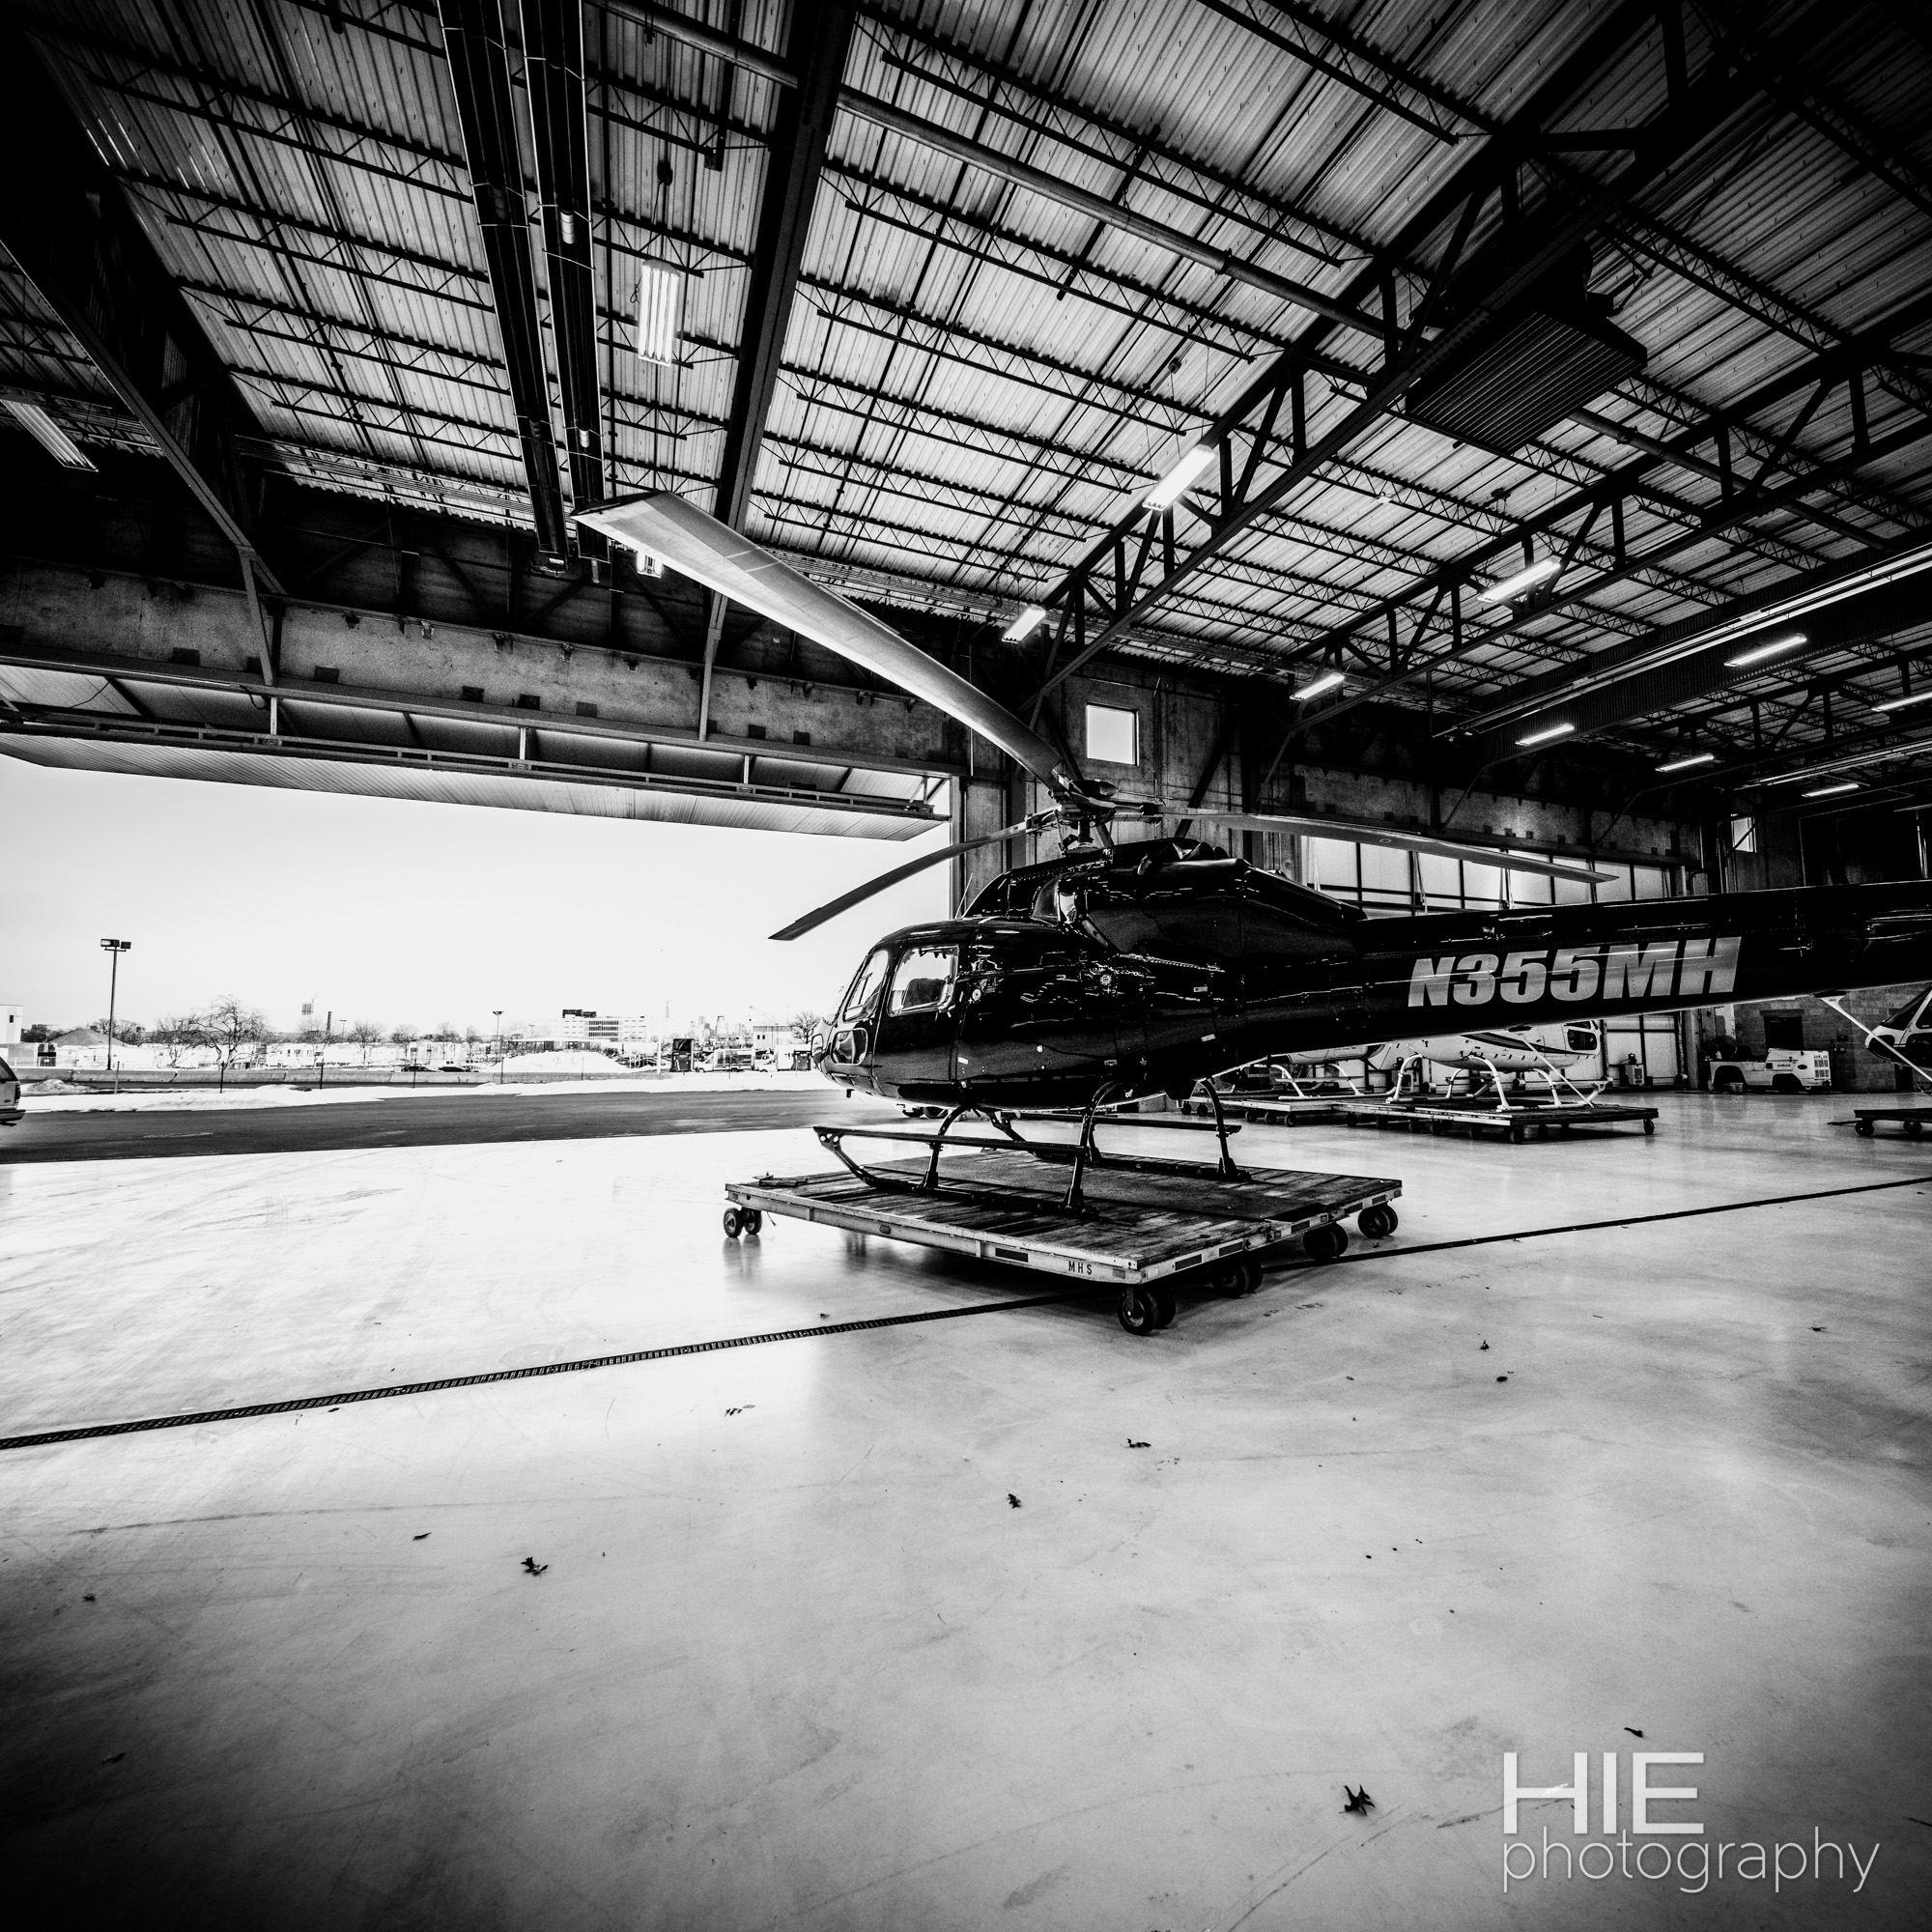 New York Helicopter Ride-1.jpg